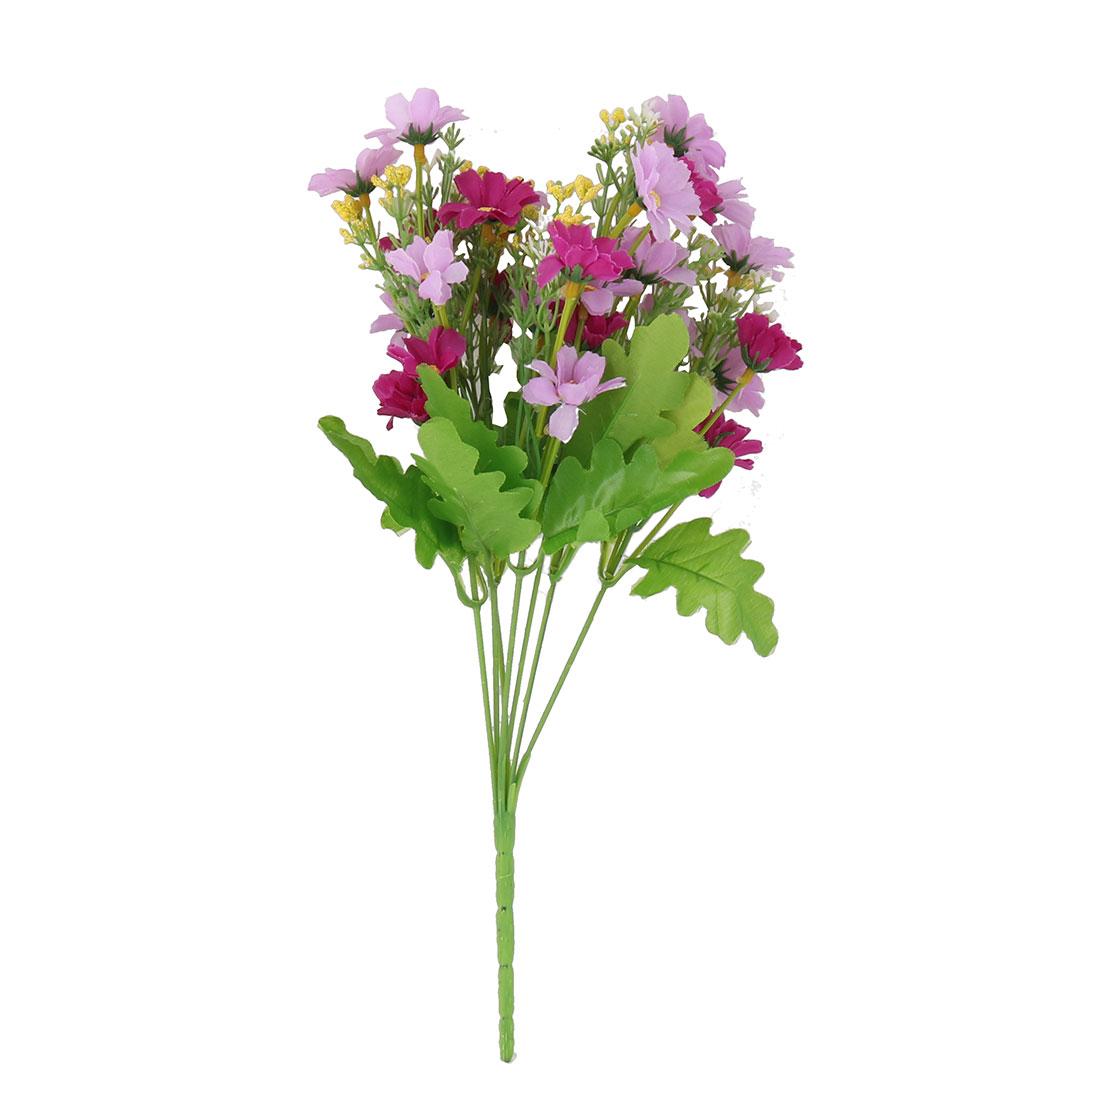 Home Office Longlasting Fibre Purple Daisy Emulational Artificial Flower